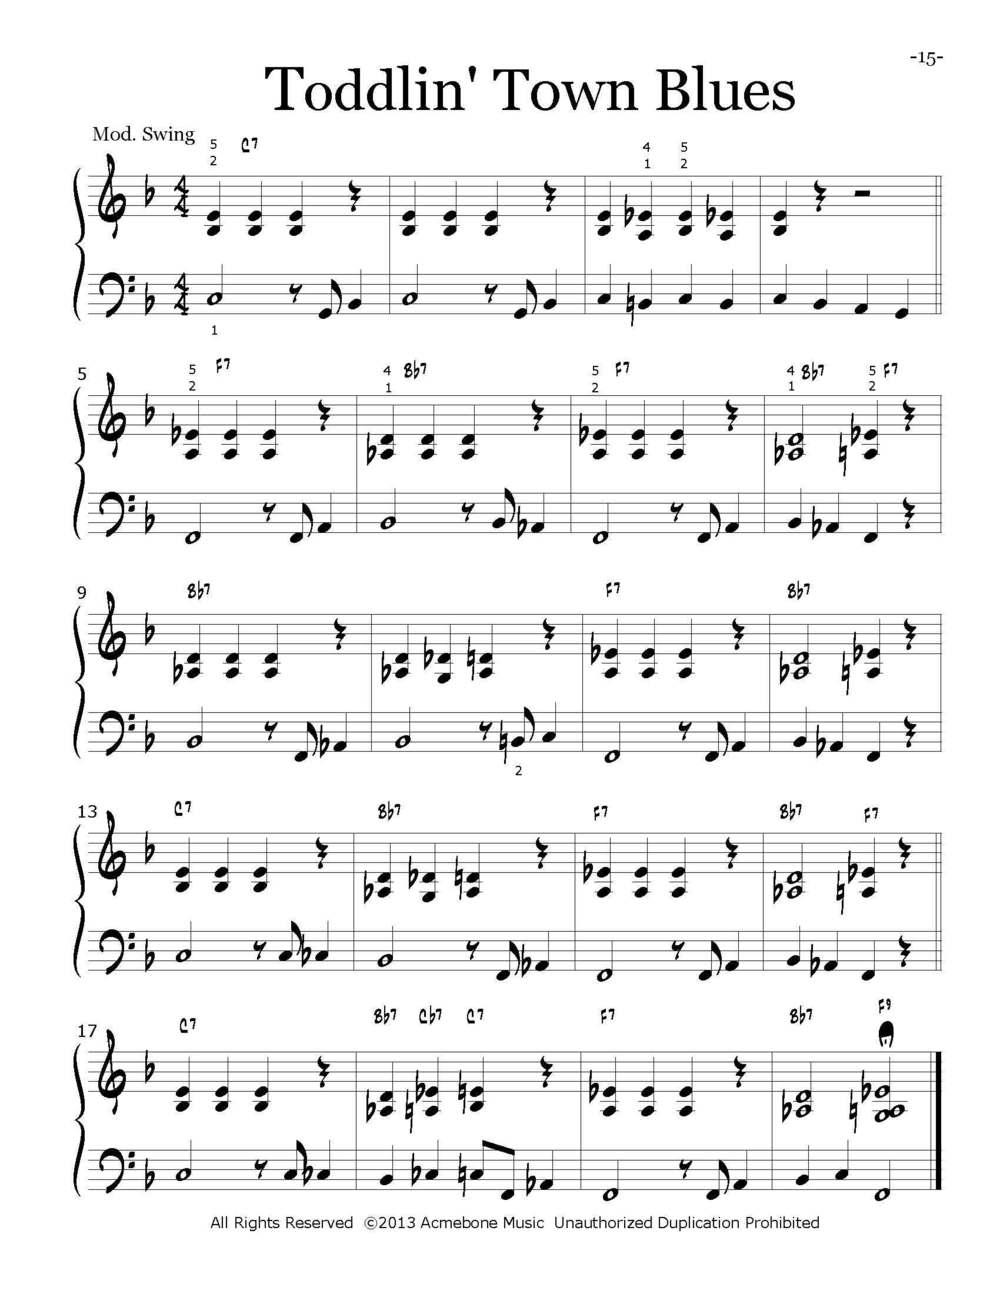 Progressive Jazz Etudes for Piano bk1 for web_Page_16.jpg